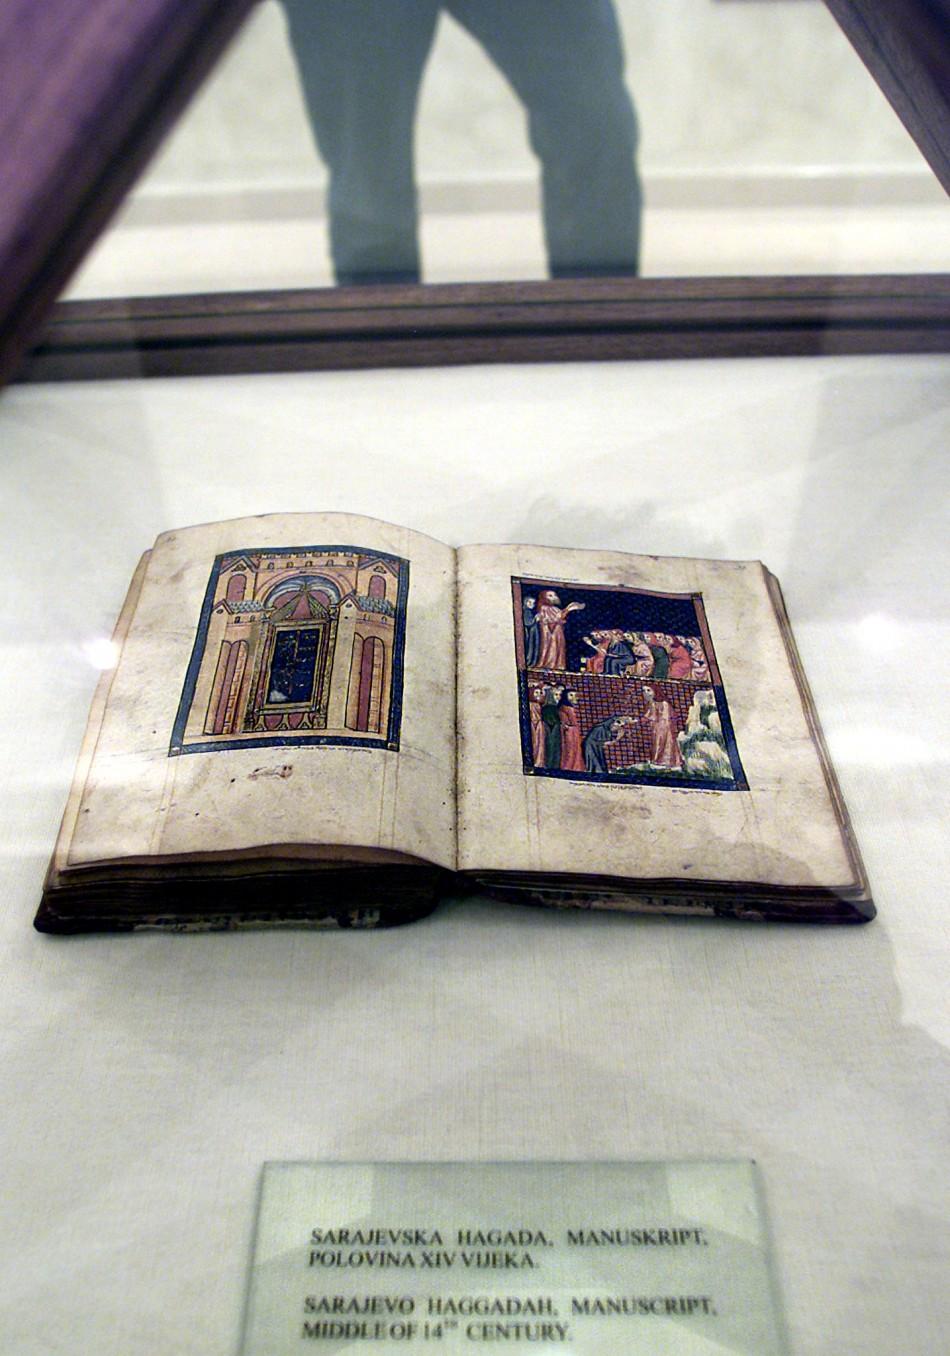 The oldest Jewish Sephardic Haggadah in the world